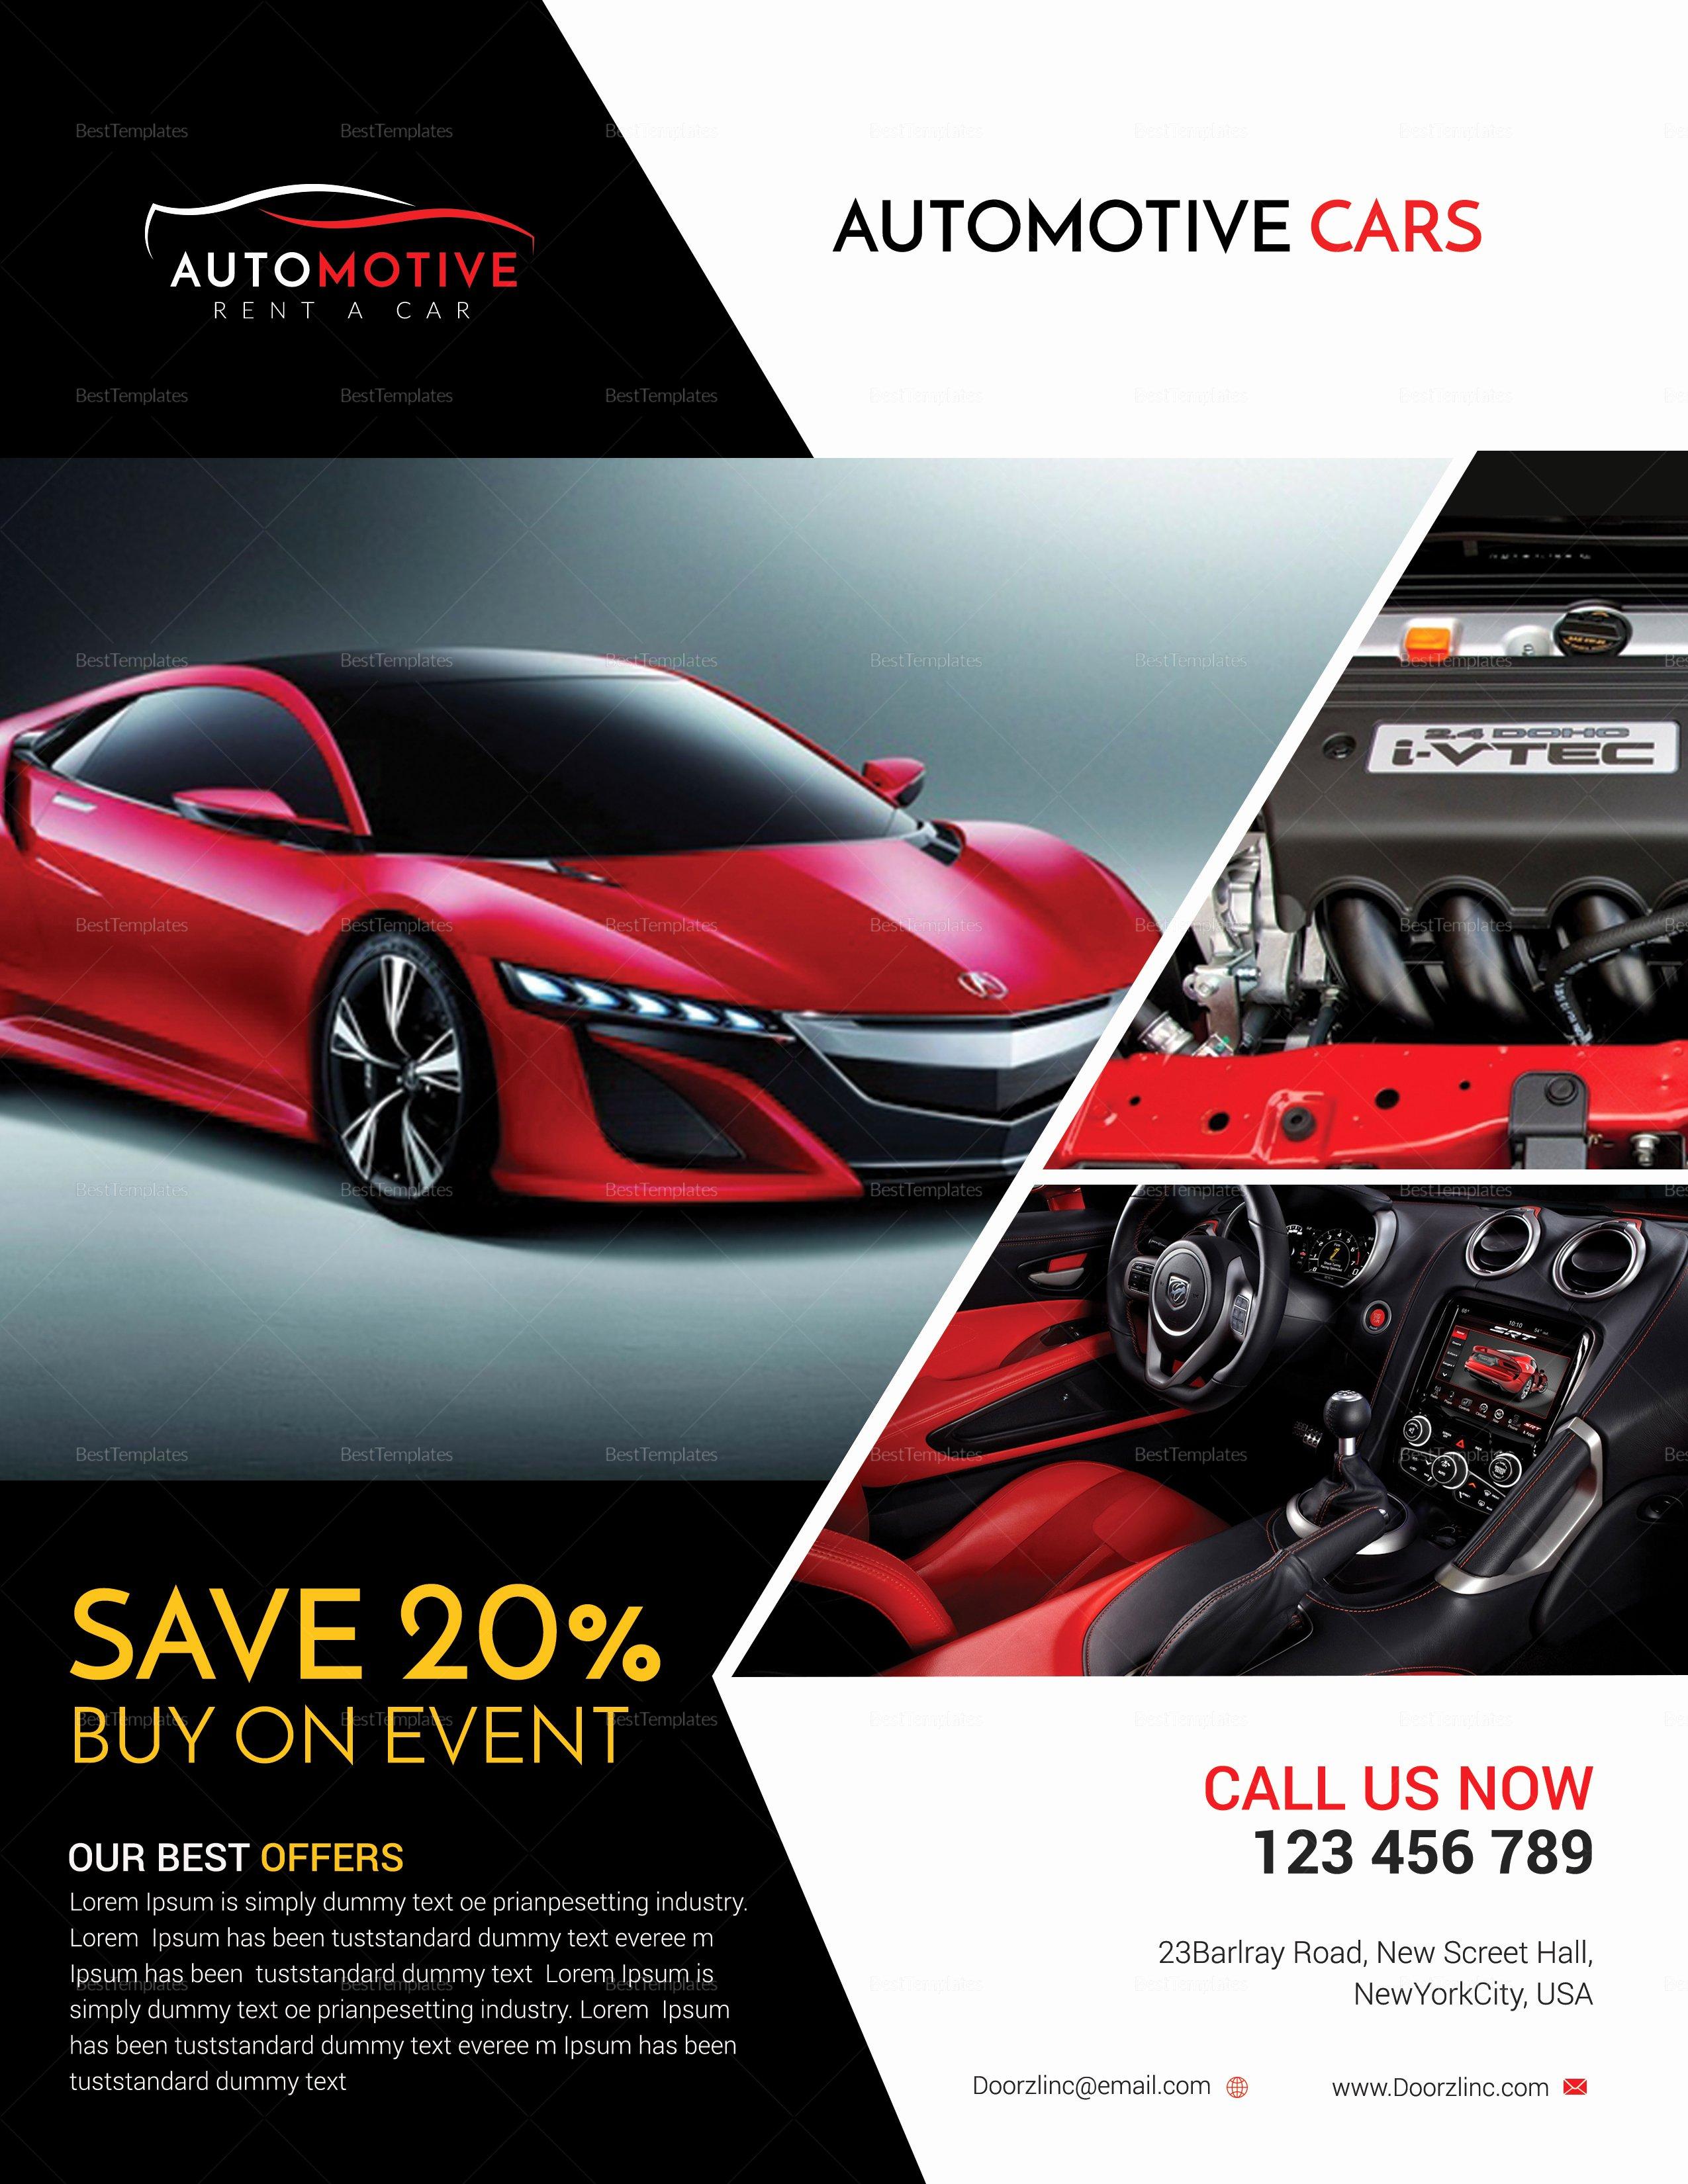 Car for Sale Template Fresh Automotive Car Sales Flyer Design Template In Psd